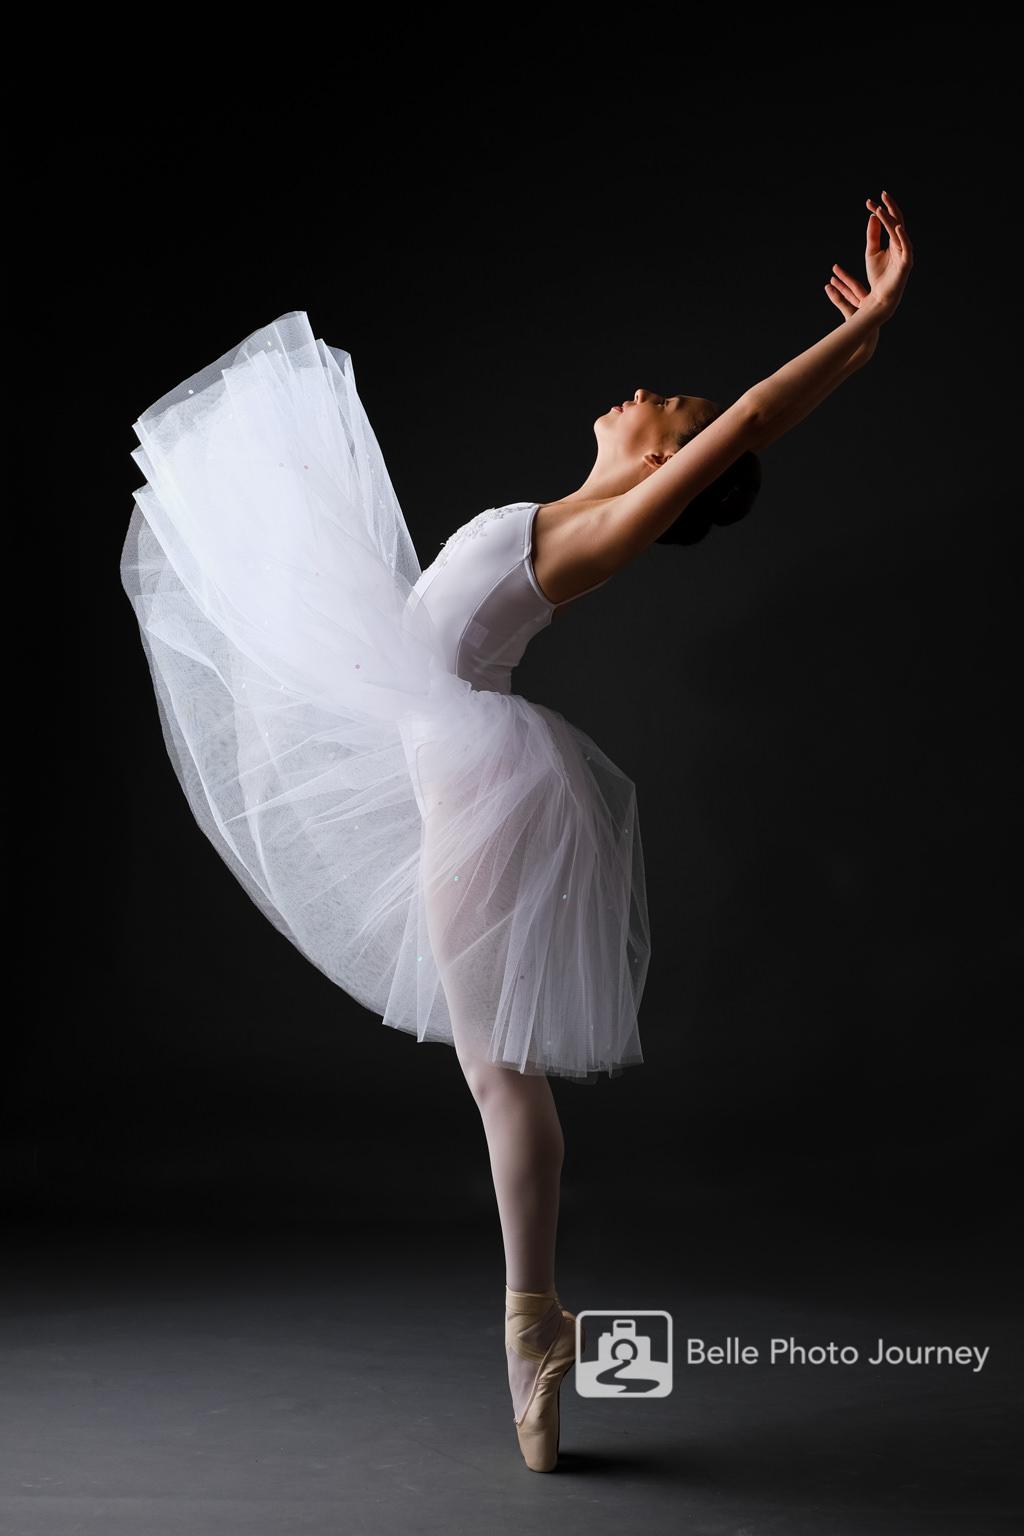 ballerina dance pose in action portrait